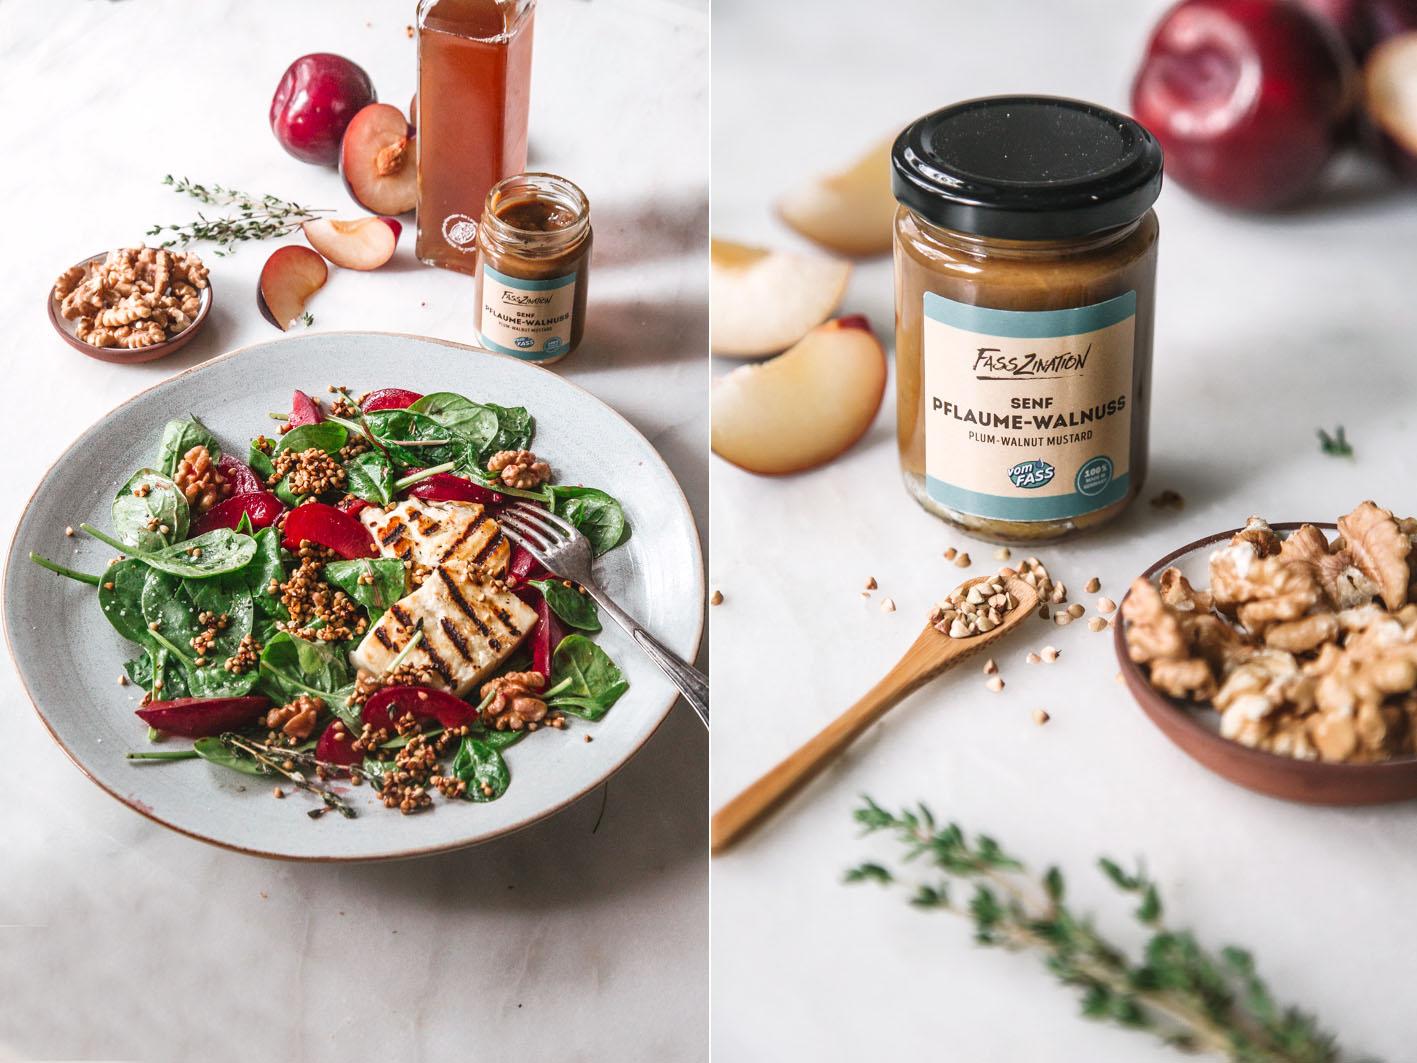 Salatdressing mit Pflaumen-Walnuss-Senf